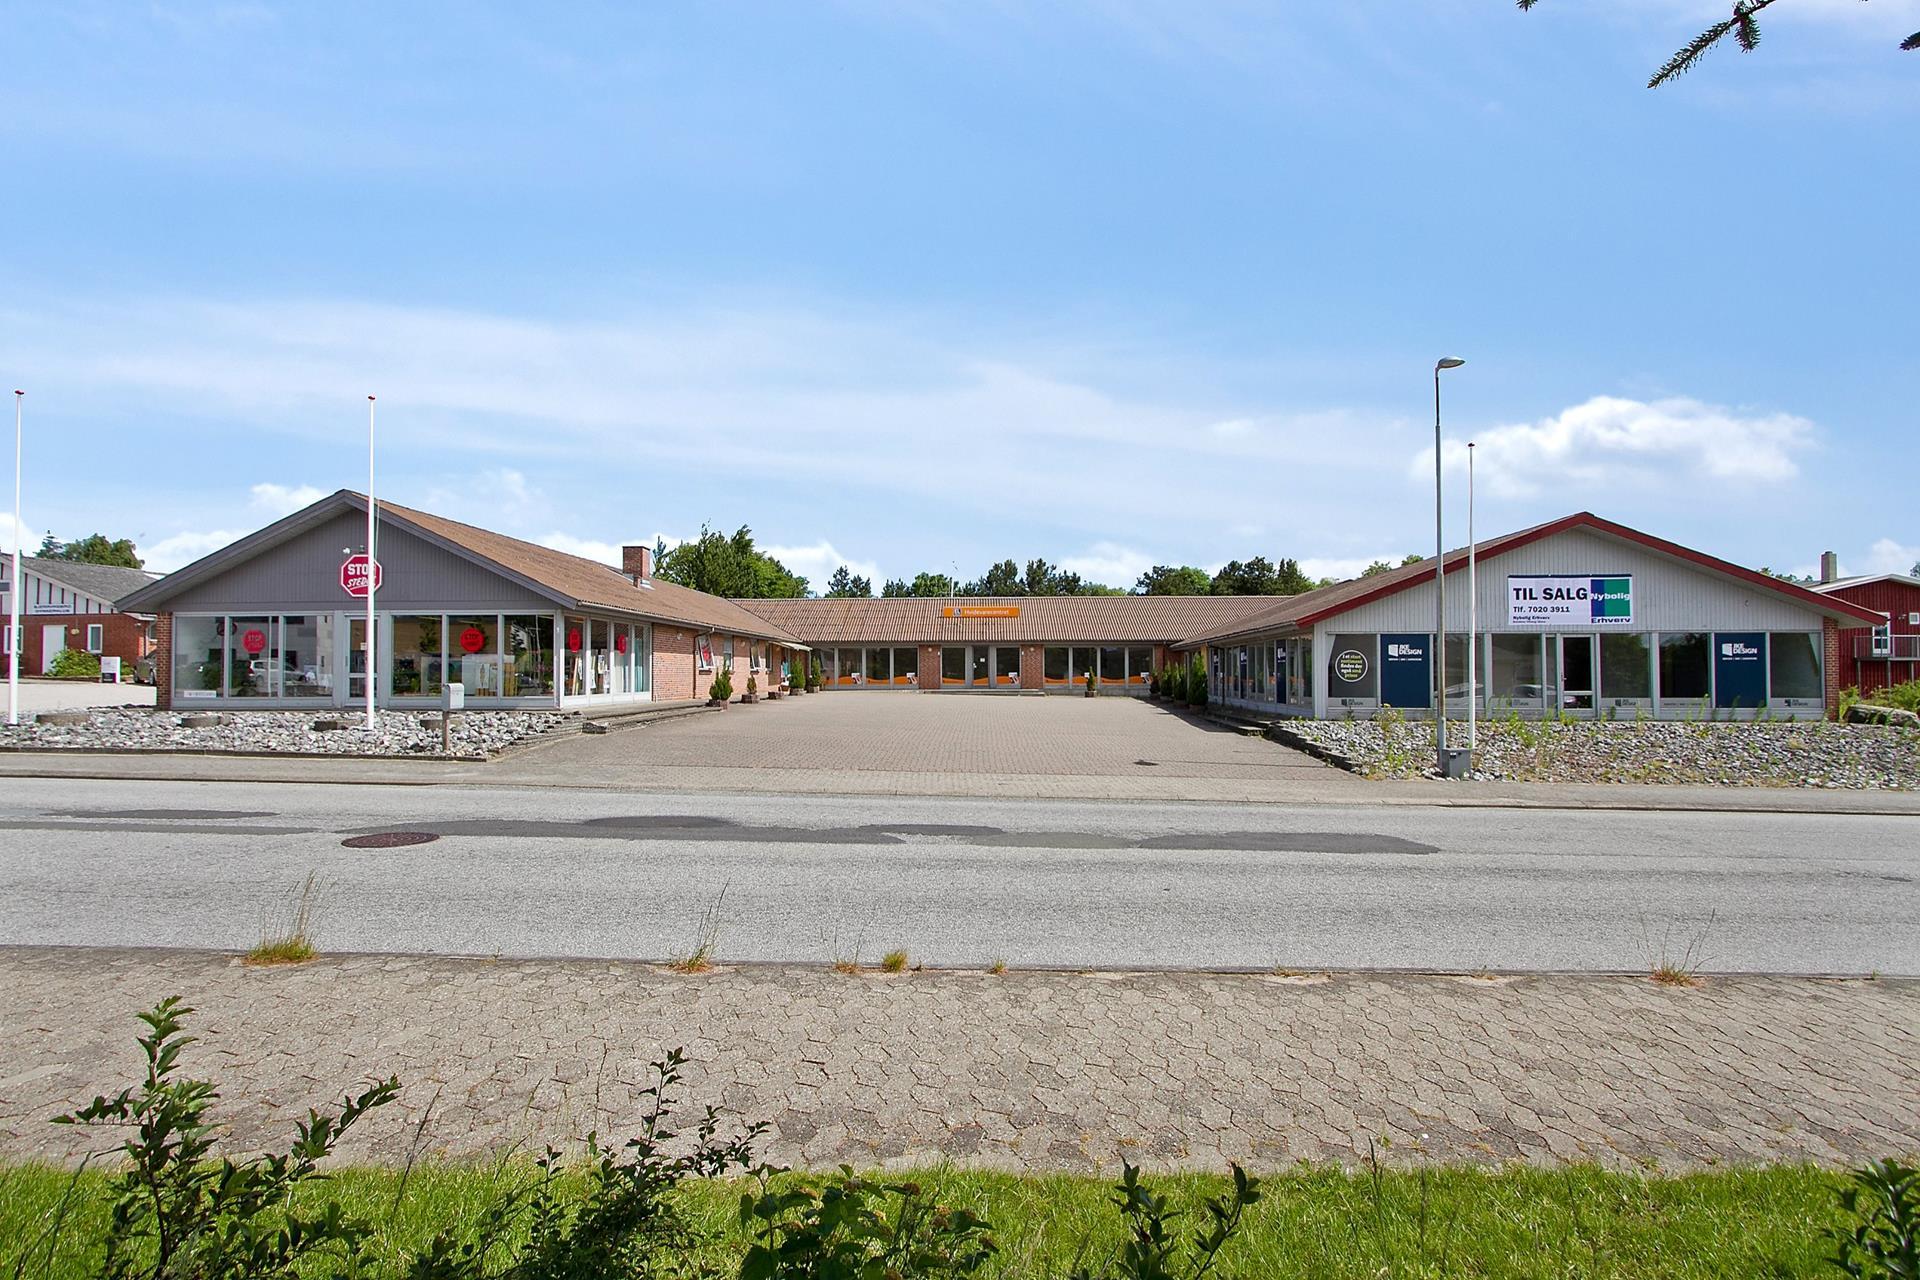 Bolig/erhverv på Pilevej i Bjerringbro - Ejendommen